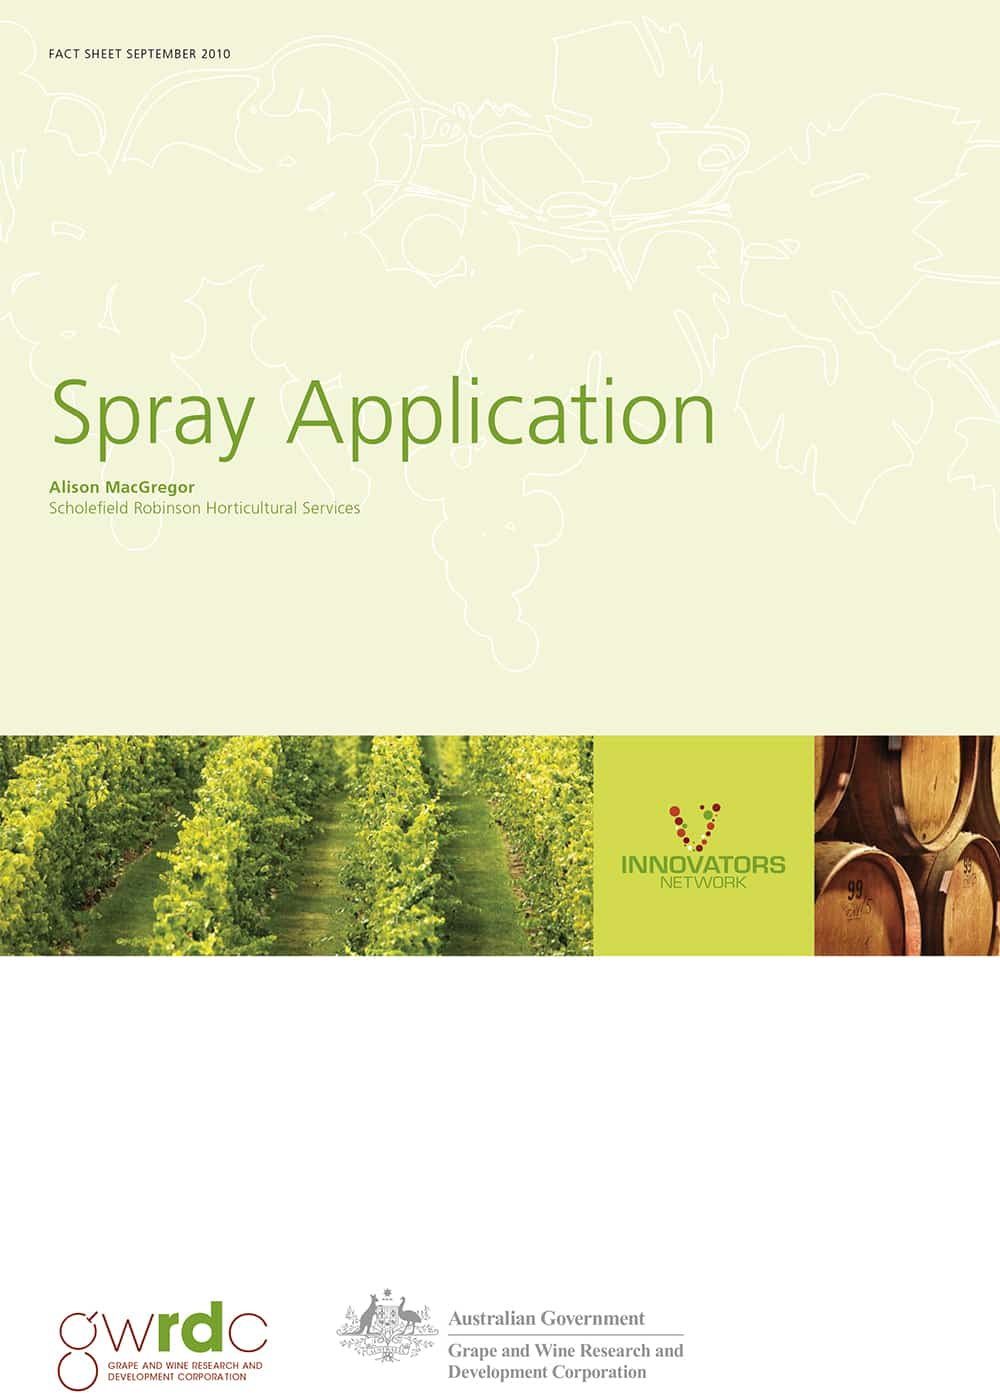 Spray Application